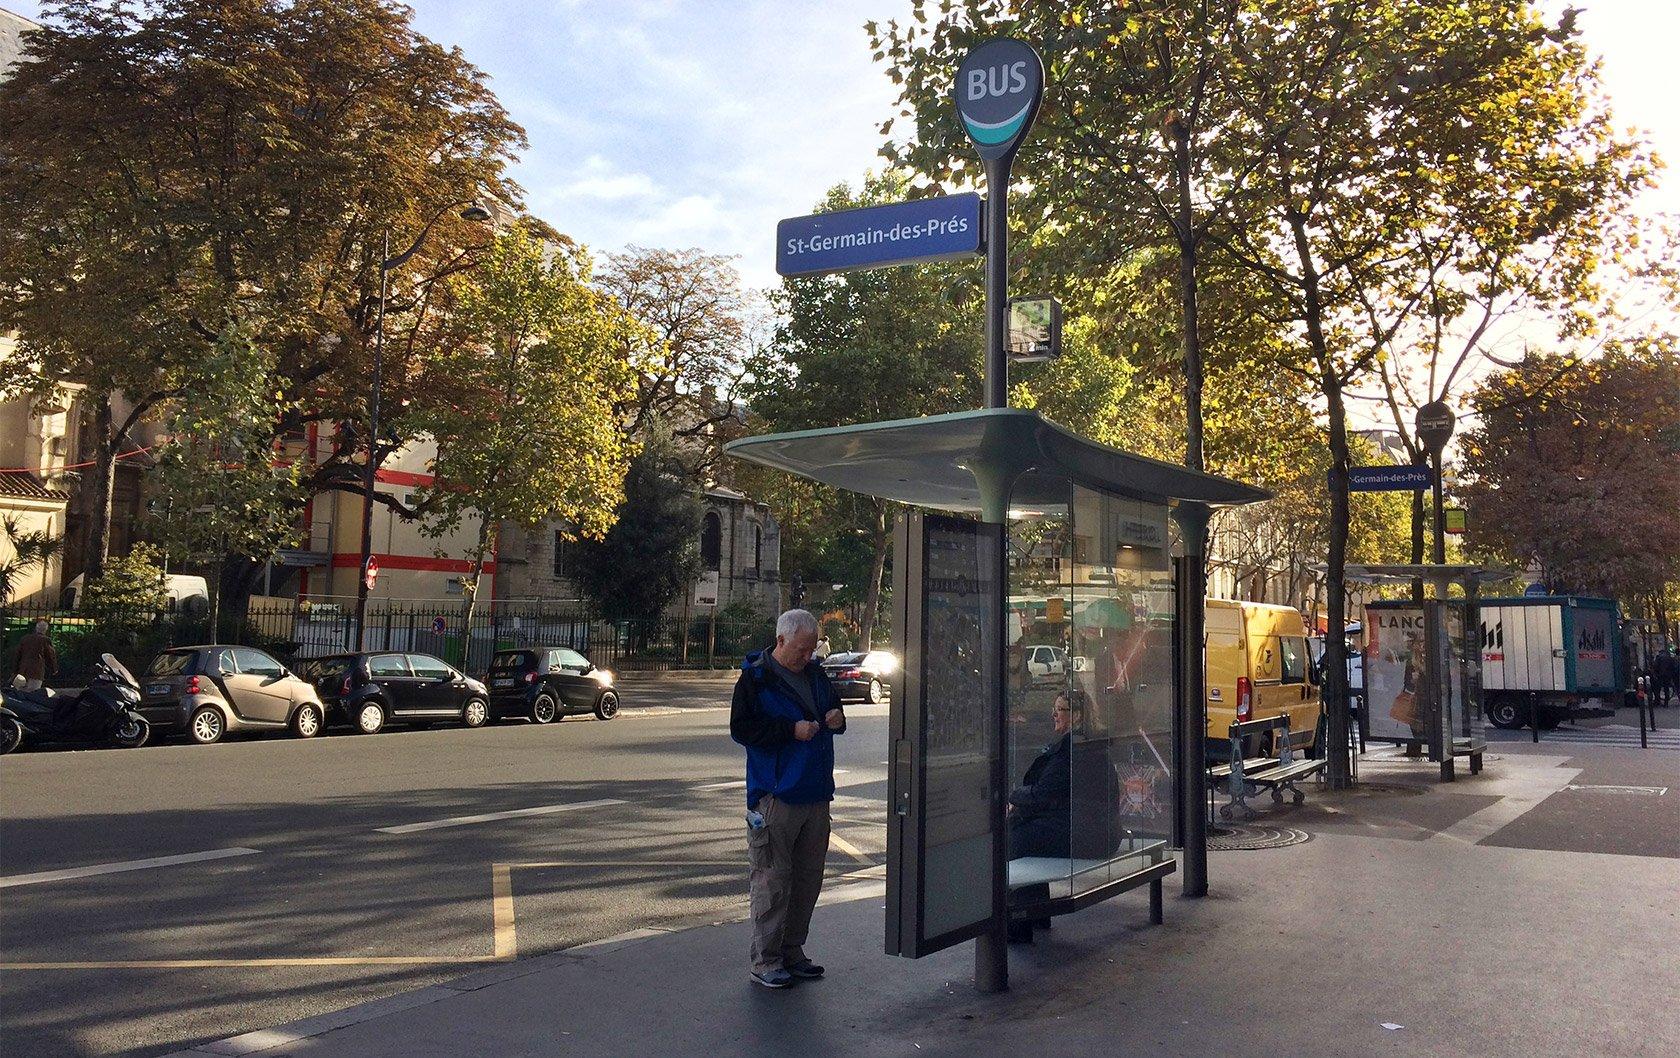 saint-germain-bus